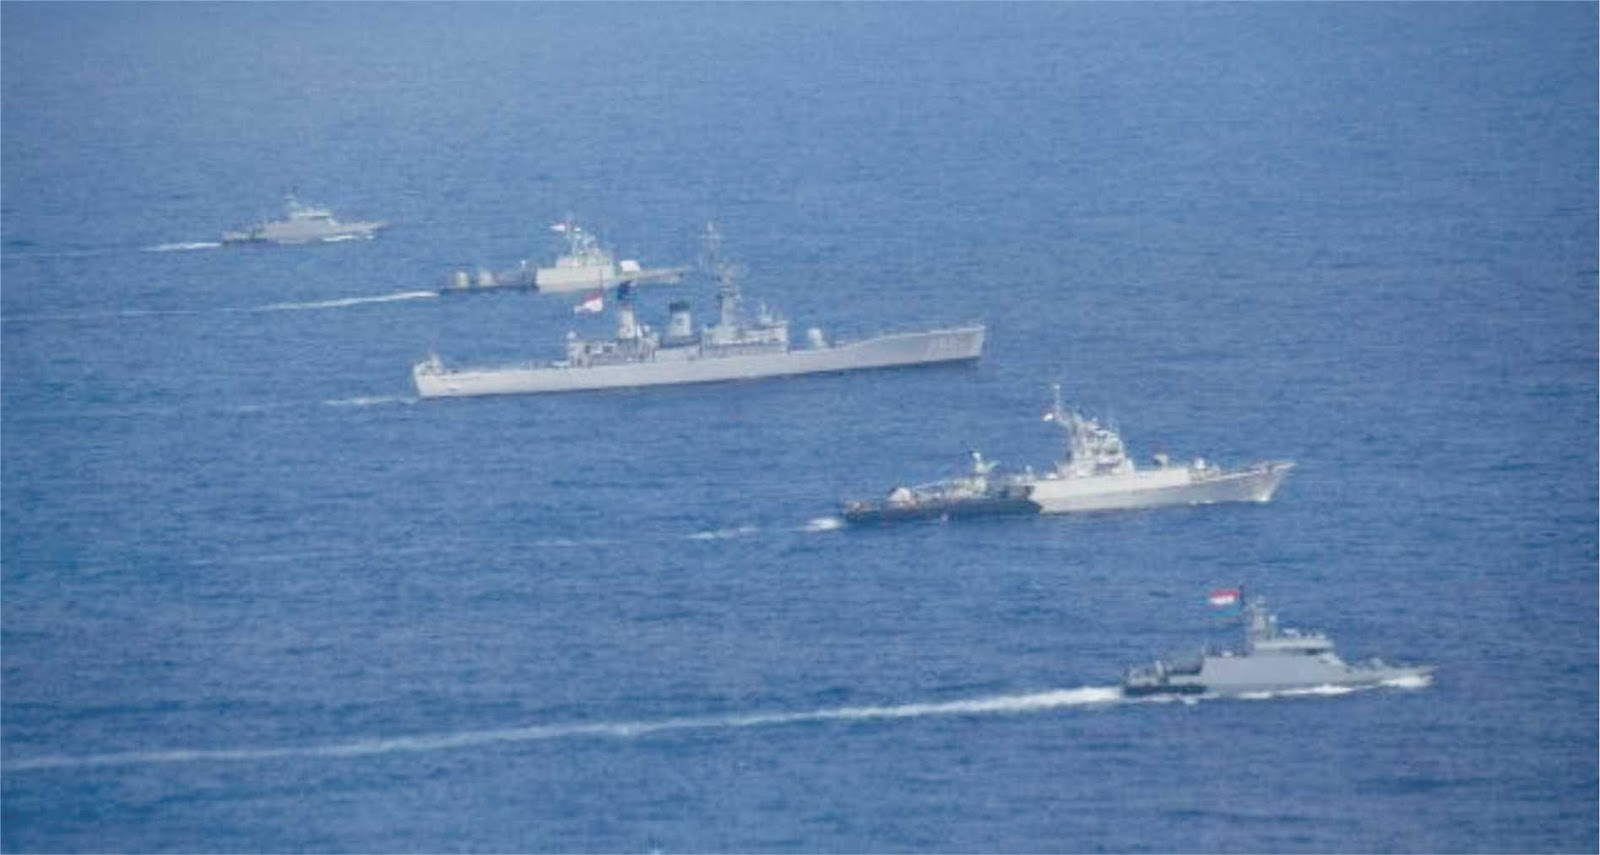 Bagaimana Indonesia bersikap di ketegangan maritim di kawasan LCS